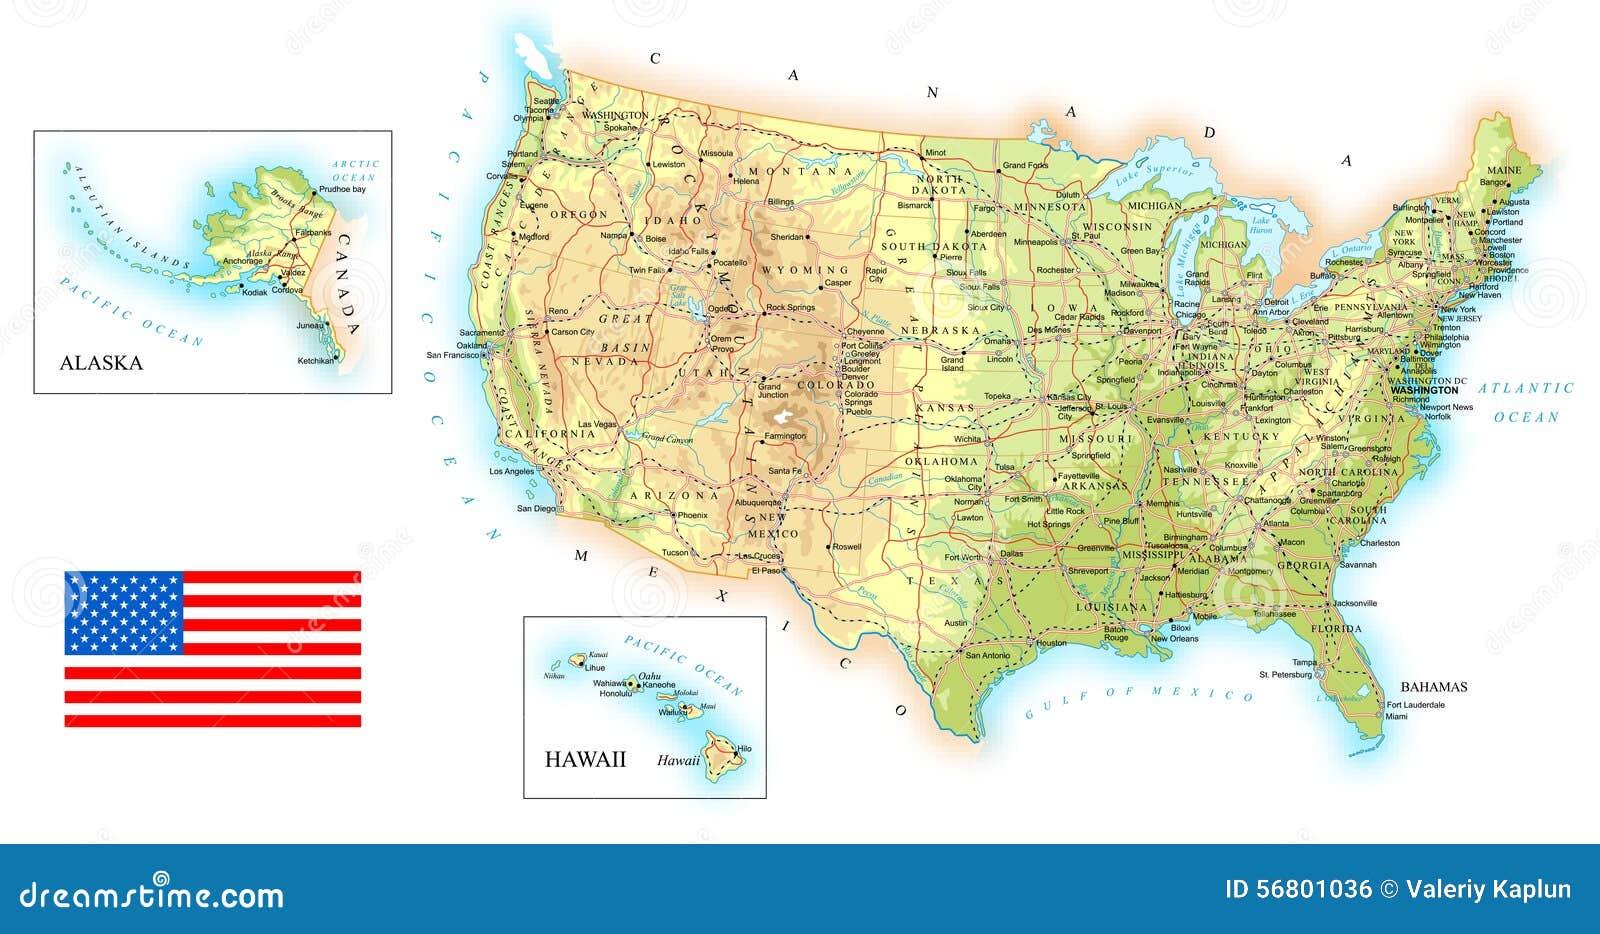 Usa Ausfuhrliche Topographische Karte Illustration Vektor